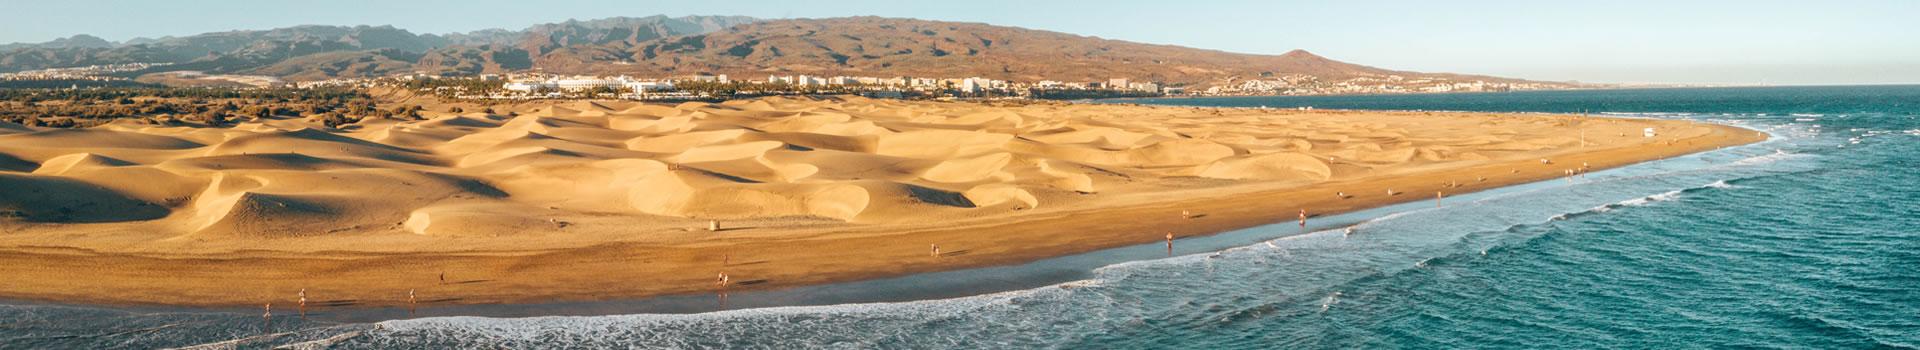 Canary Islands Las Palmas Hotels